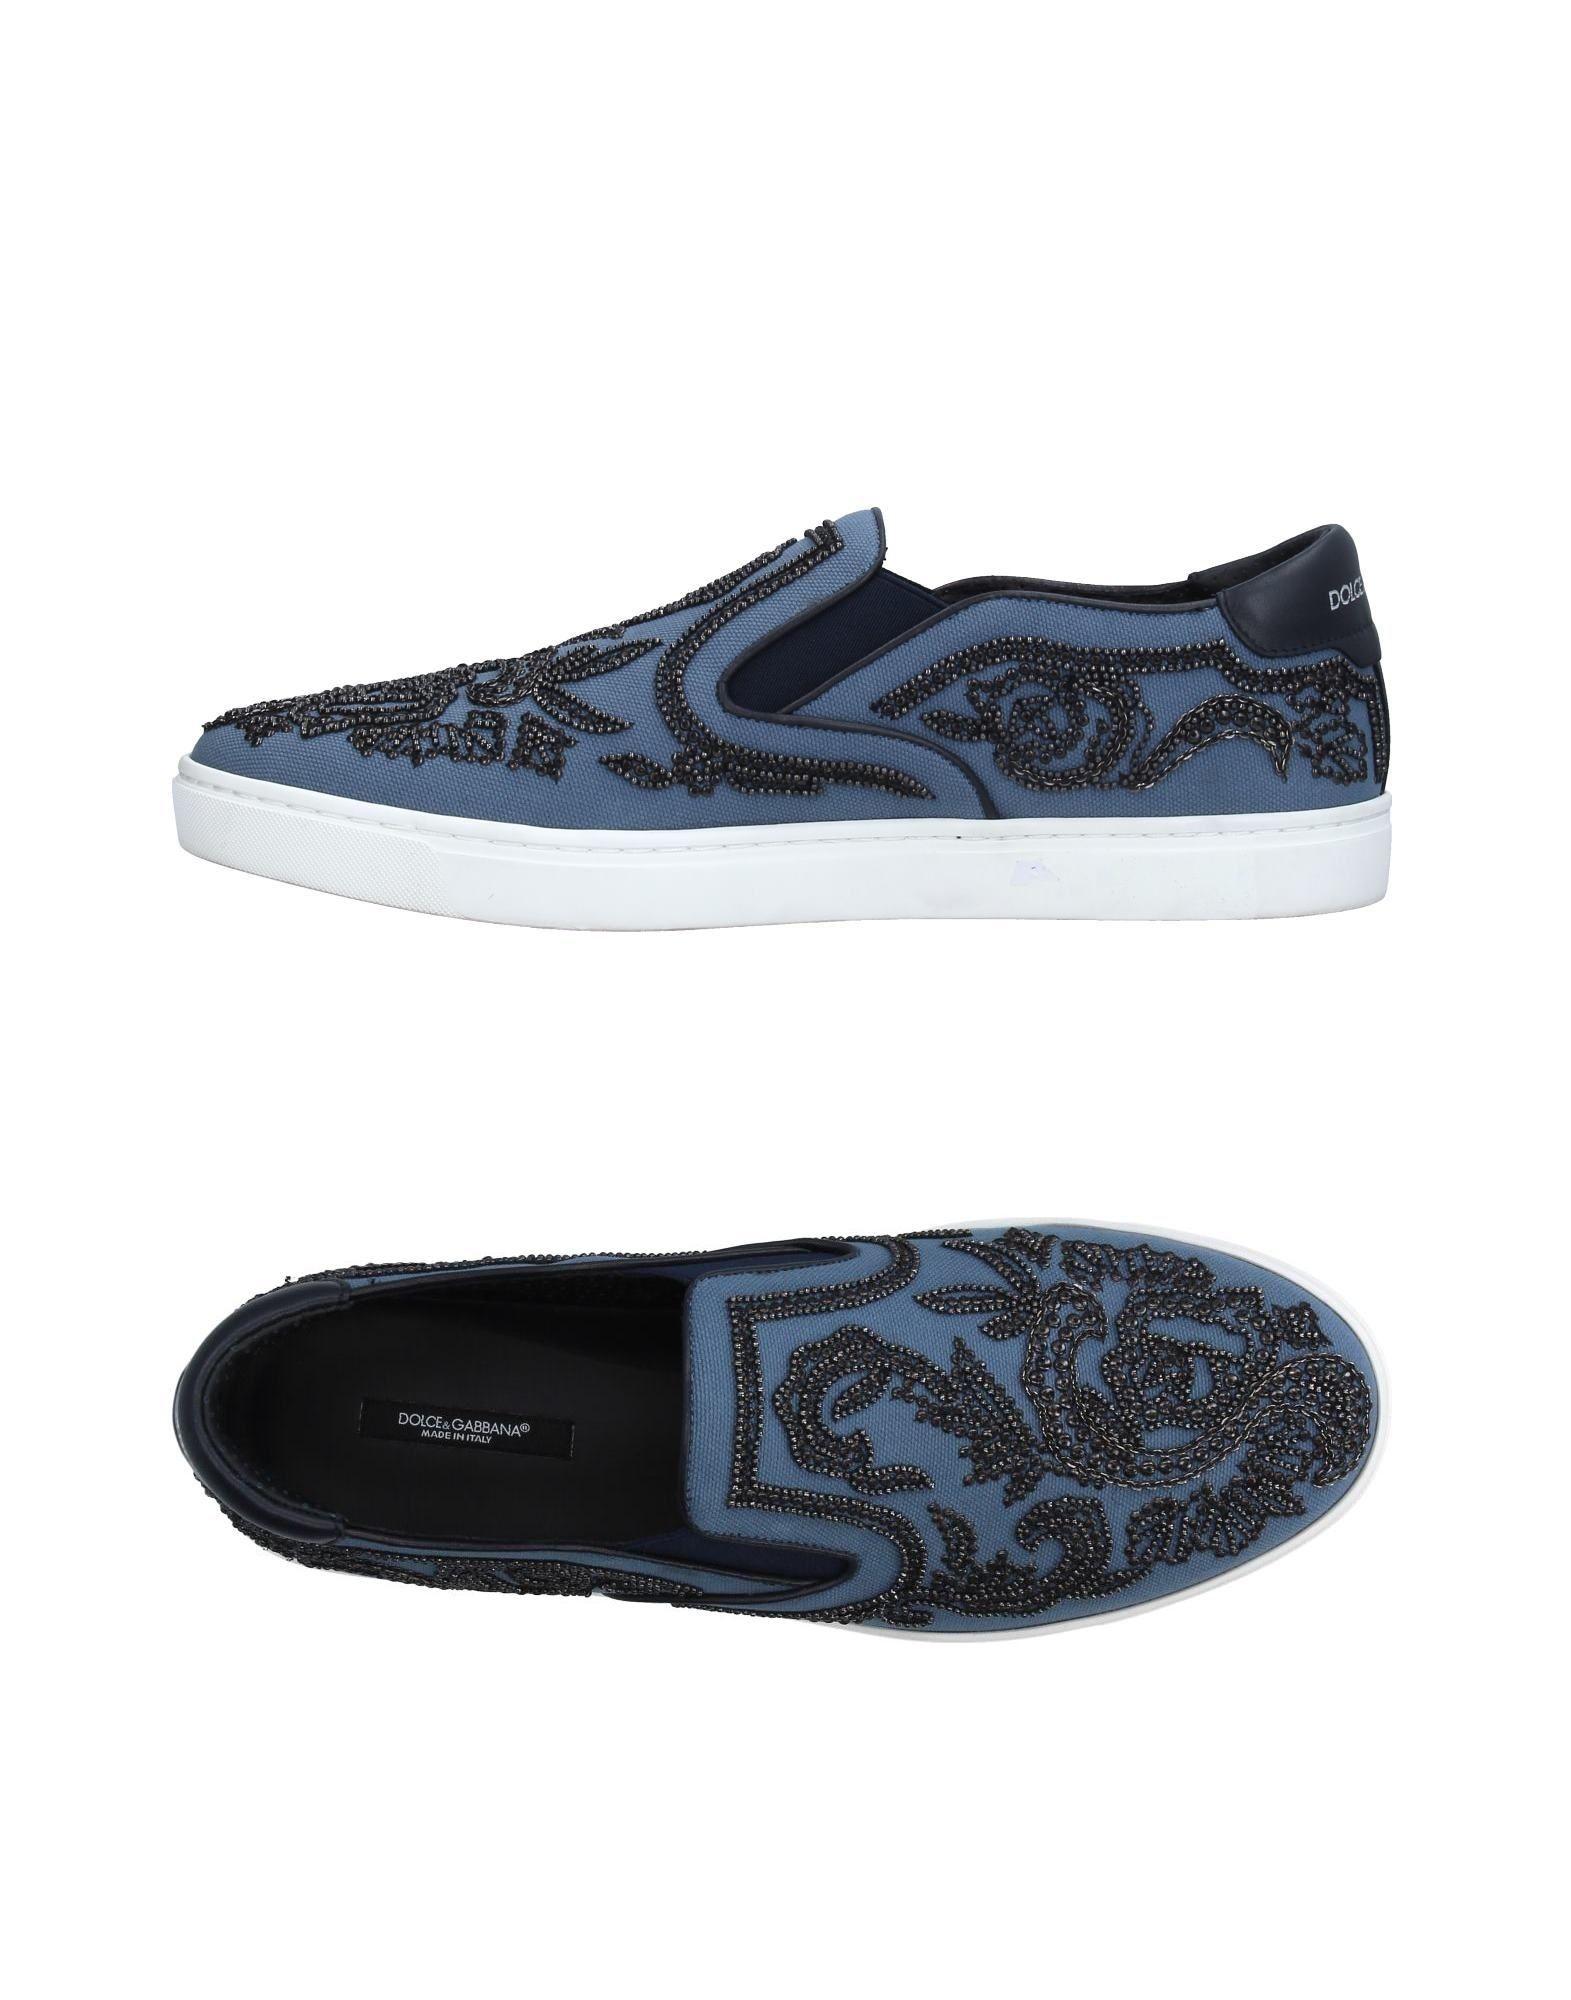 Dolce & Gabbana Sneakers Herren  11243019IP Gute Qualität beliebte Schuhe